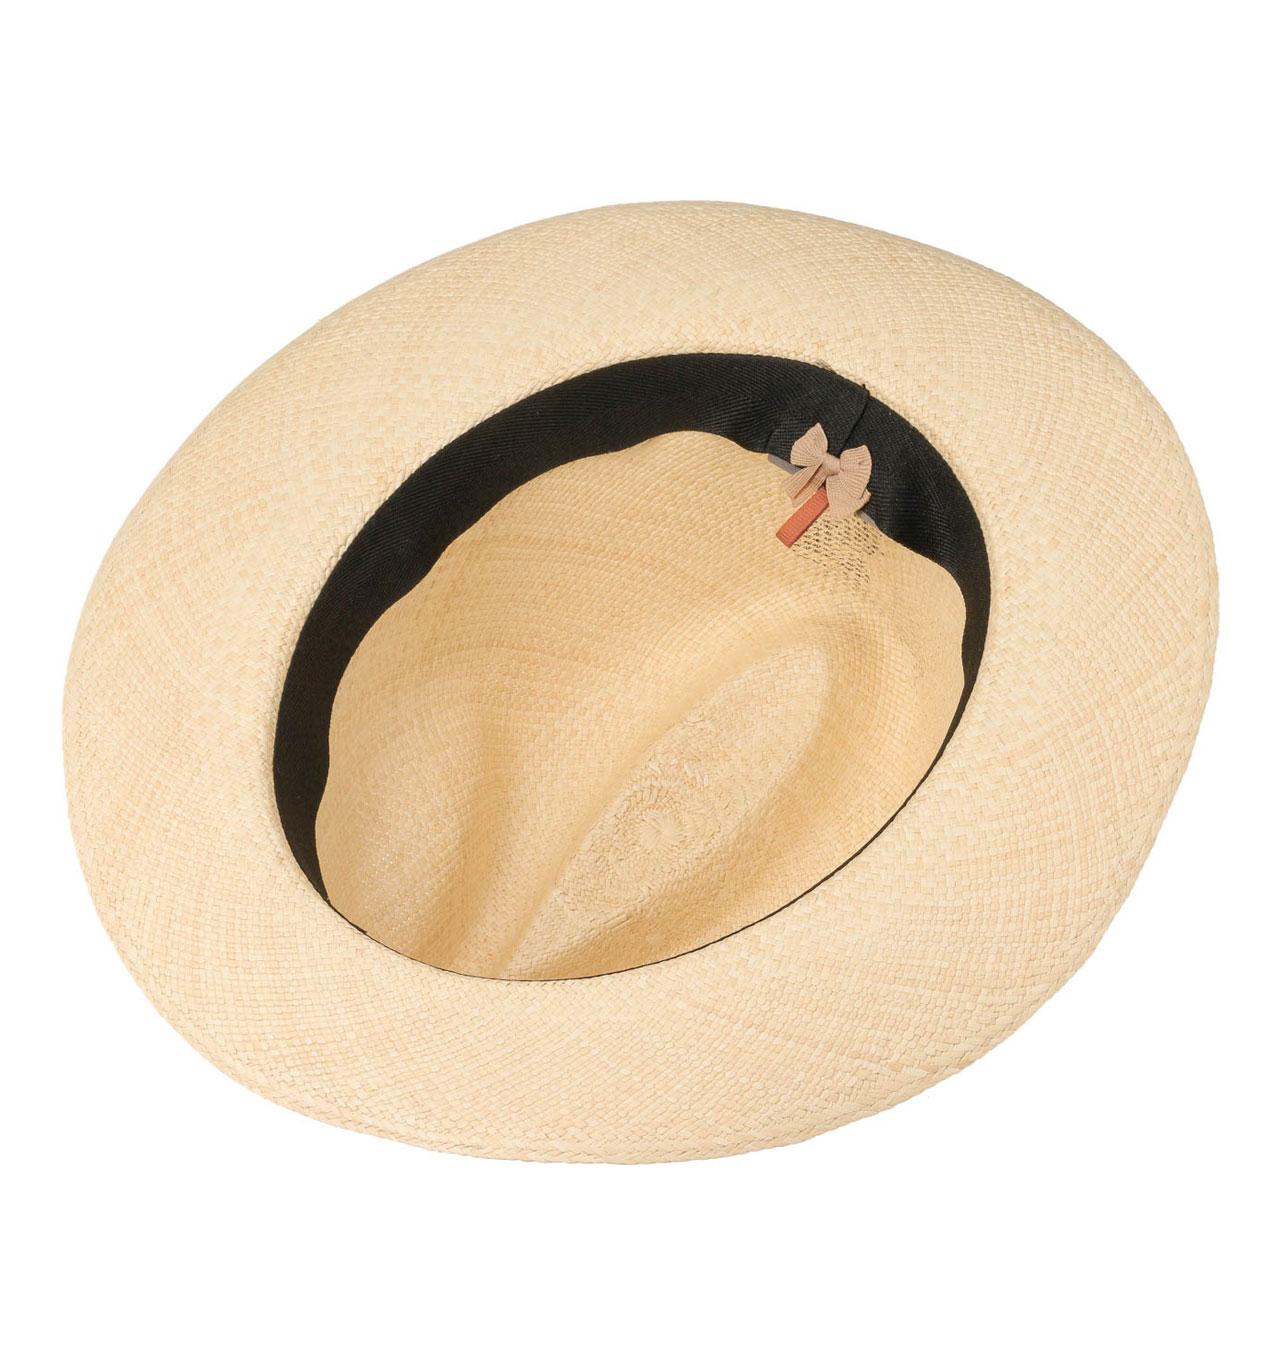 b123725a72d3 Stetson - Valmora Fedora Panama Hat - Natural